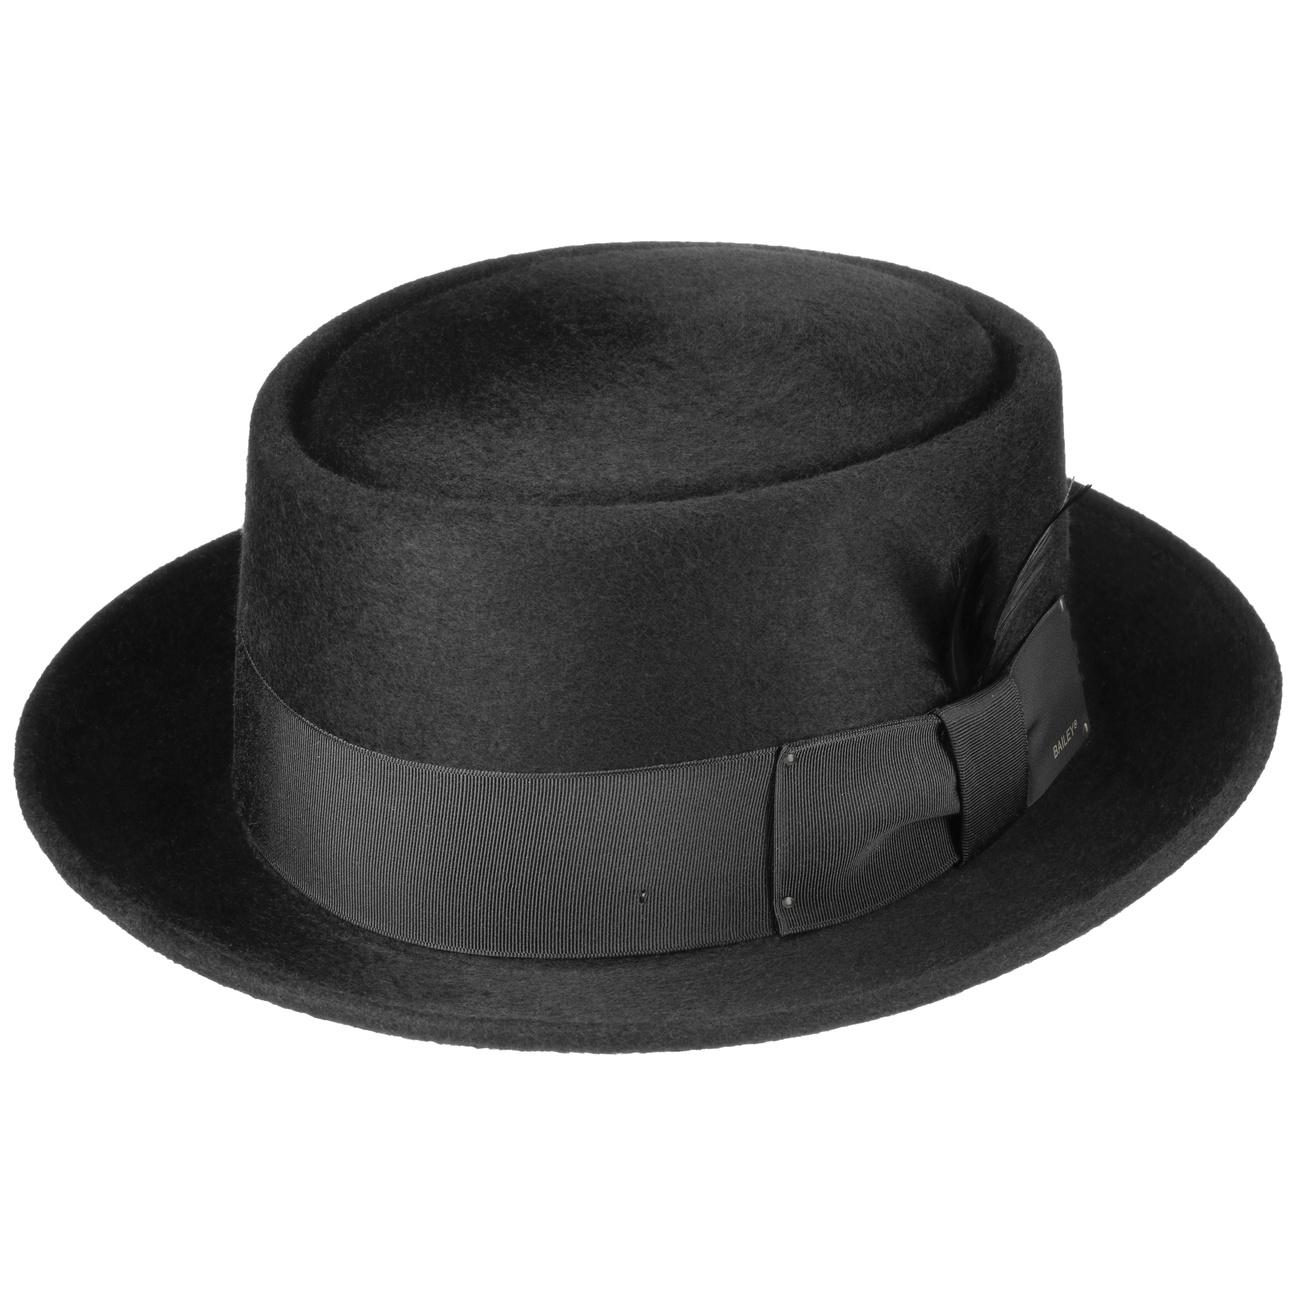 Sombrero Jett by Bailey of Hollywood  sombrero pork pie